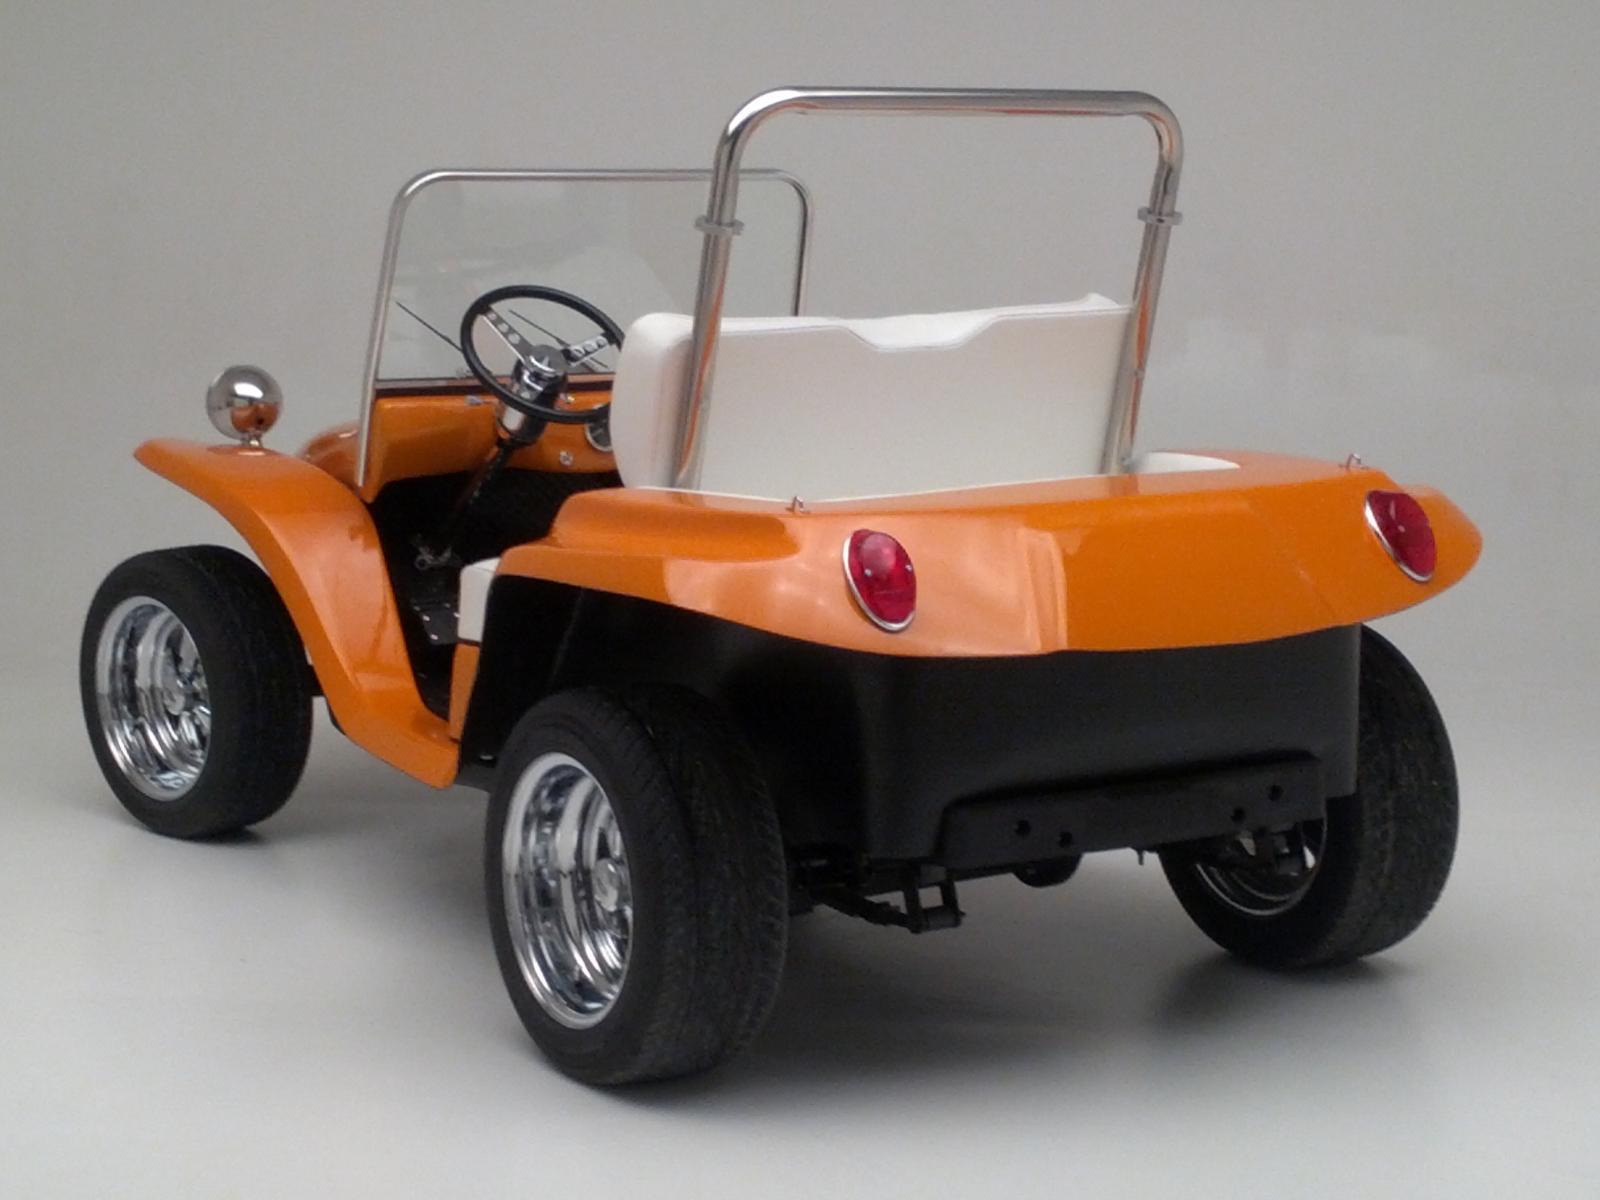 TheSamba.com :: Gallery - Dune Buggy Golf Cart Project on